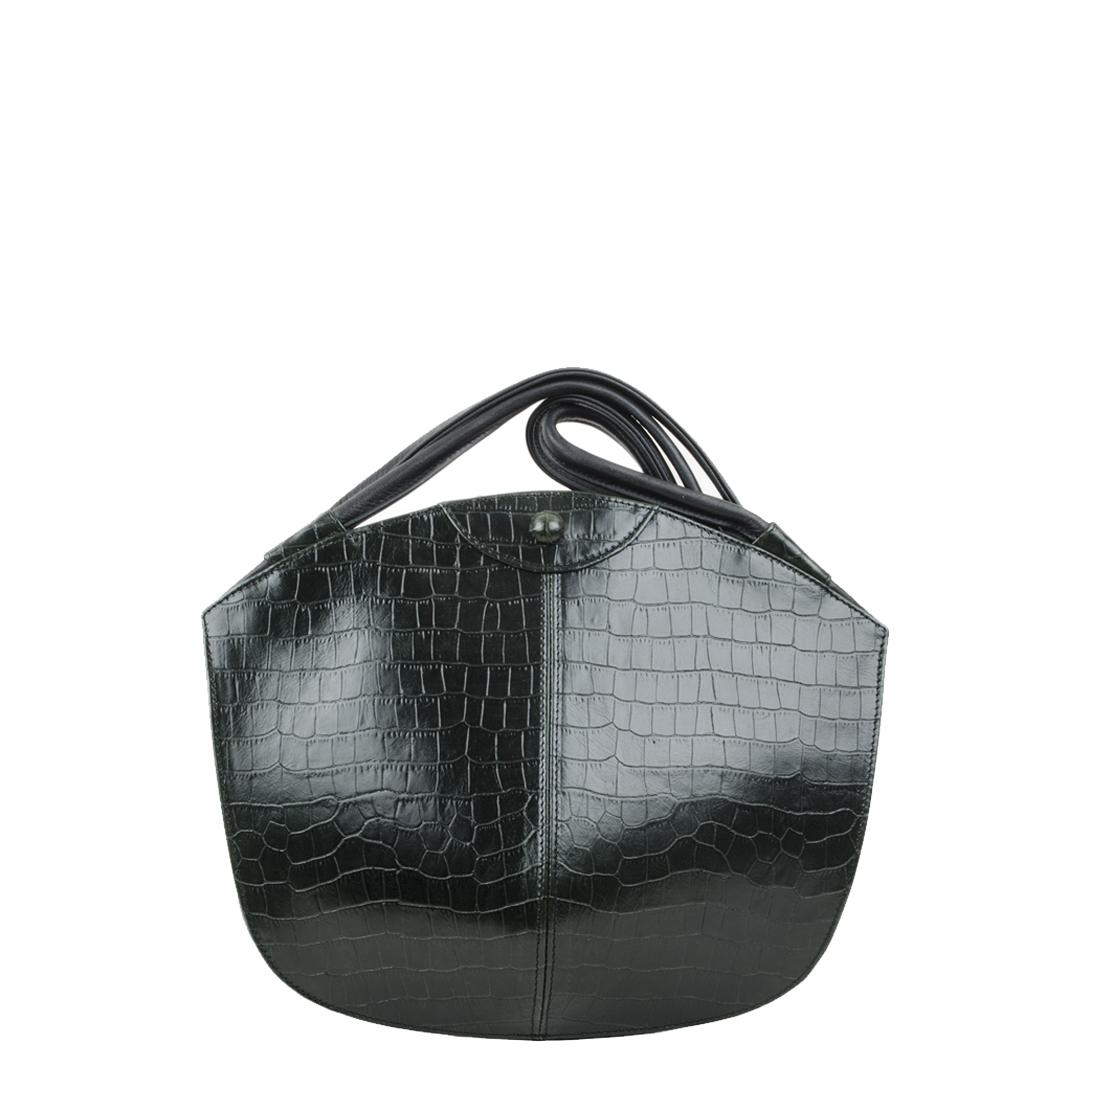 Carmen Dark Green Crocodile Print Leather Shoulder Bag